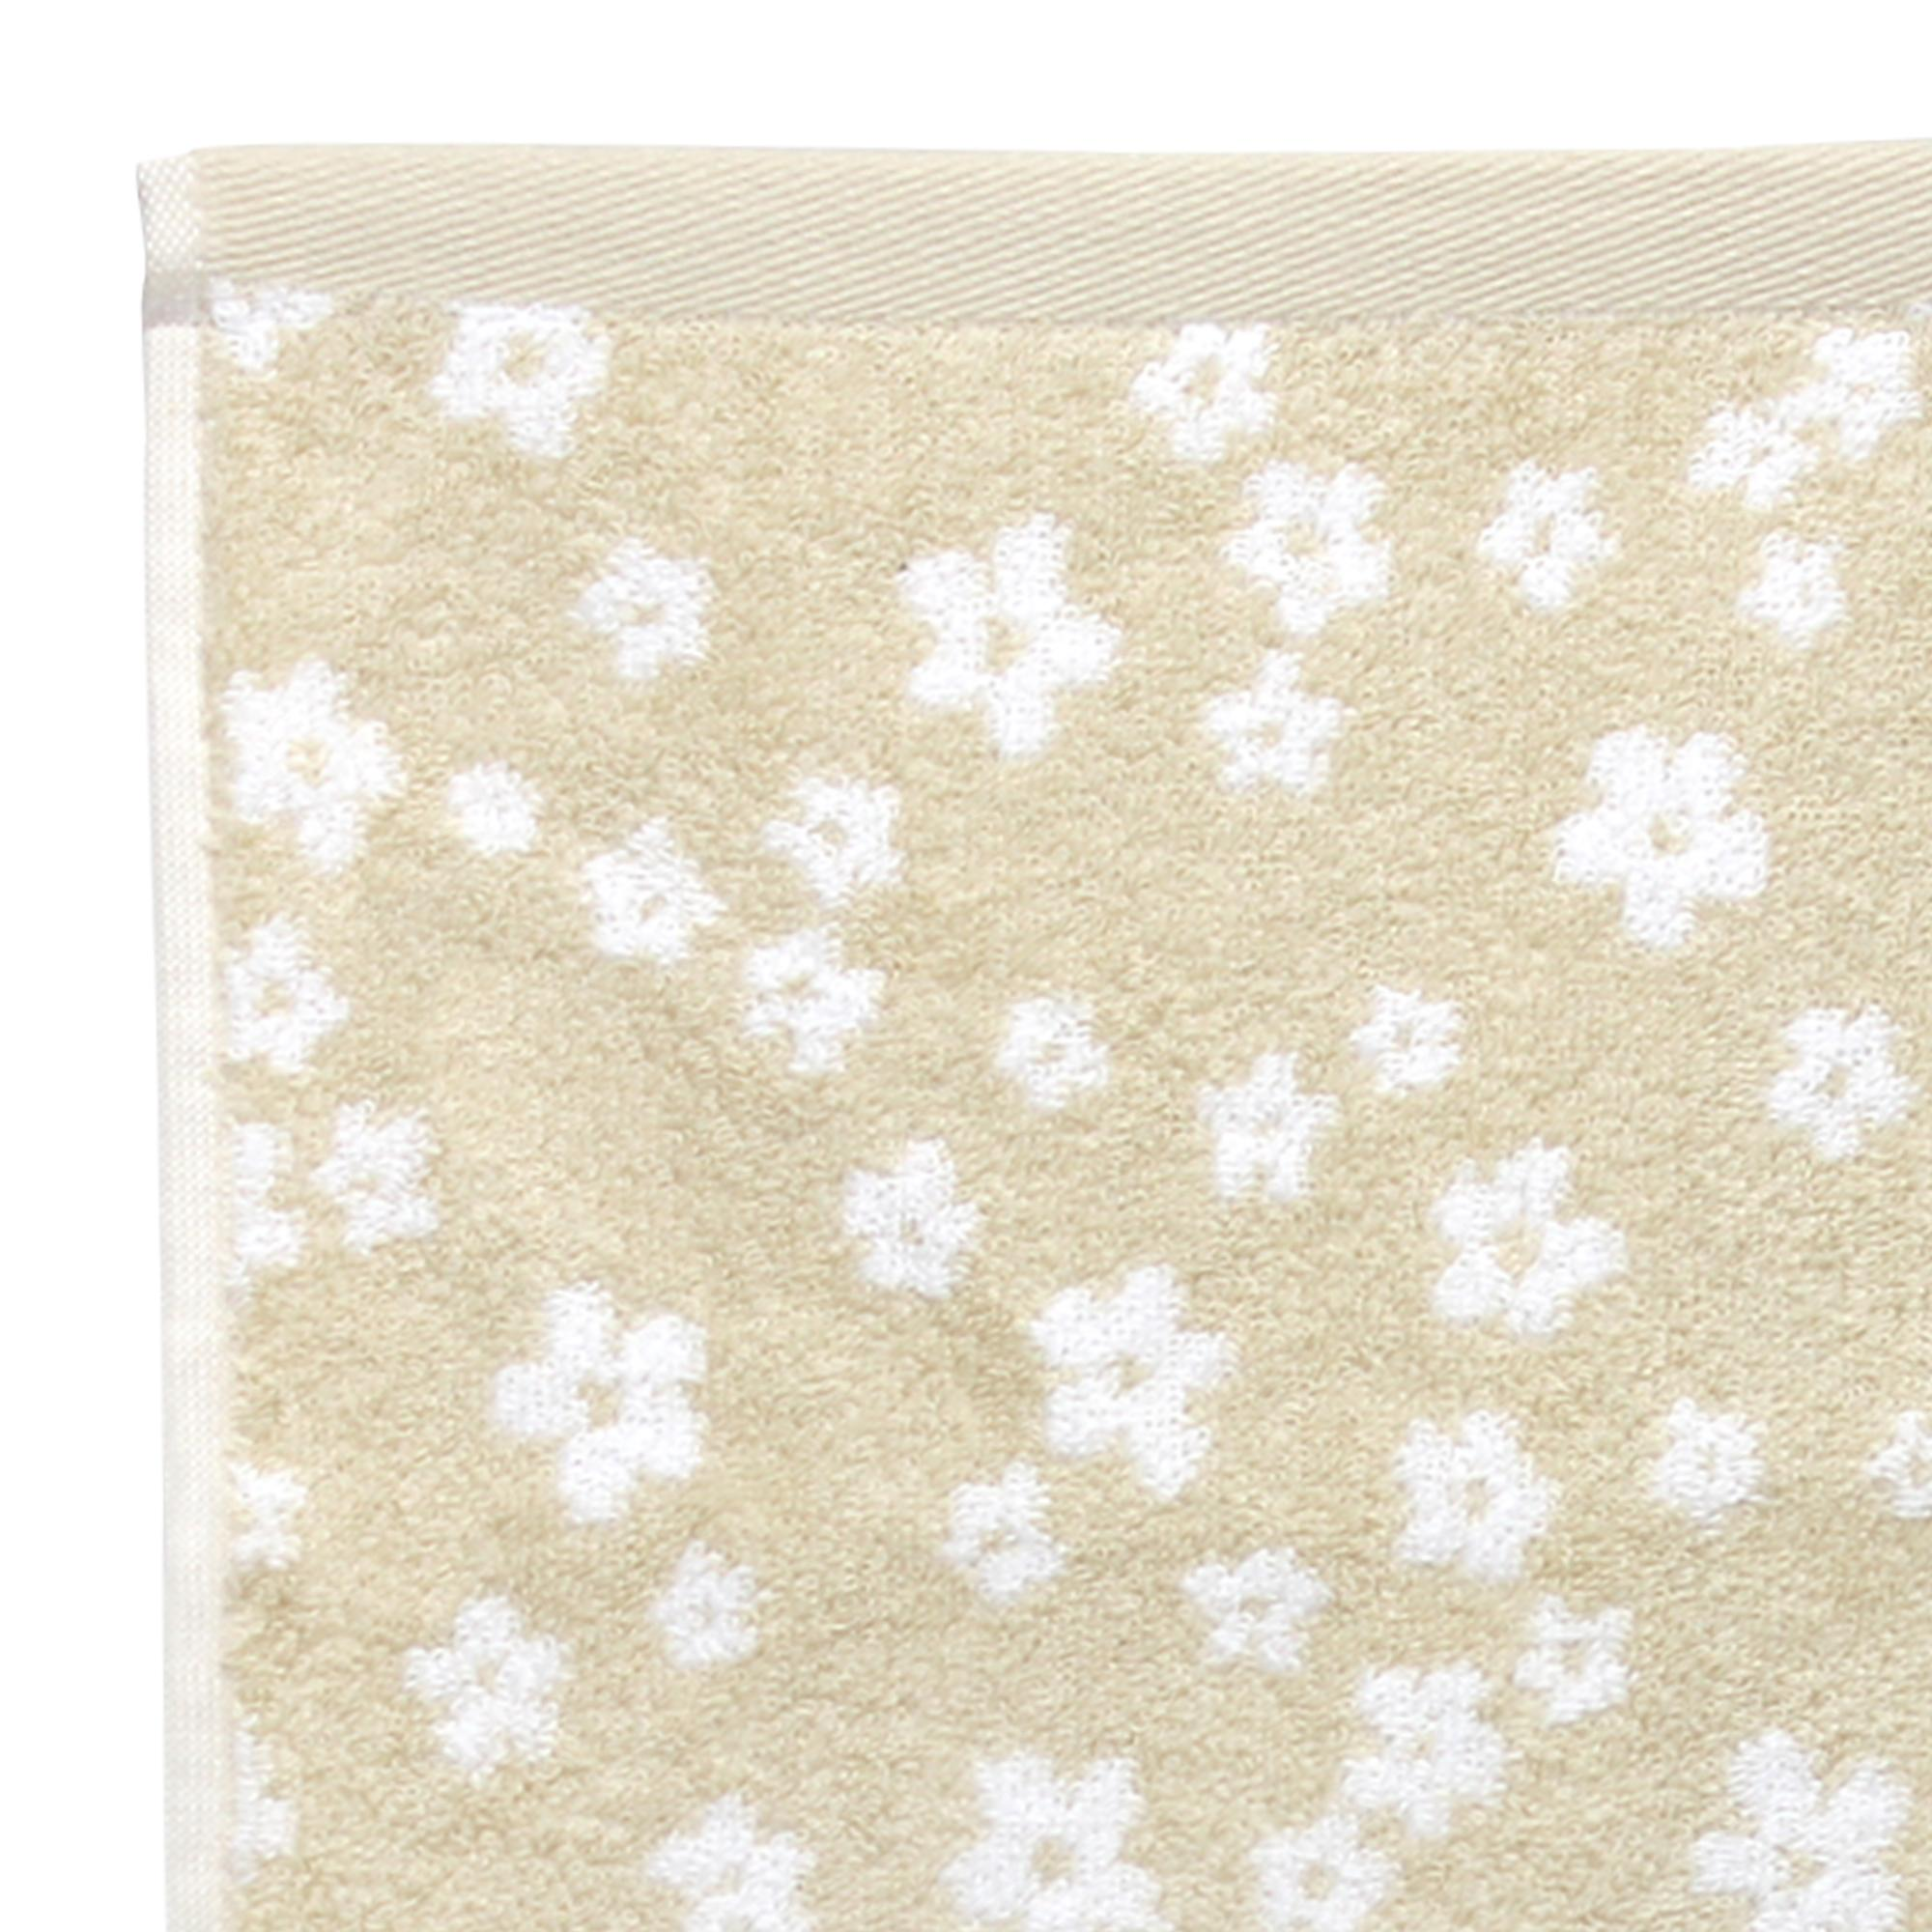 drap de bain 100x150 100 coton 520g m2 facile beige ebay. Black Bedroom Furniture Sets. Home Design Ideas